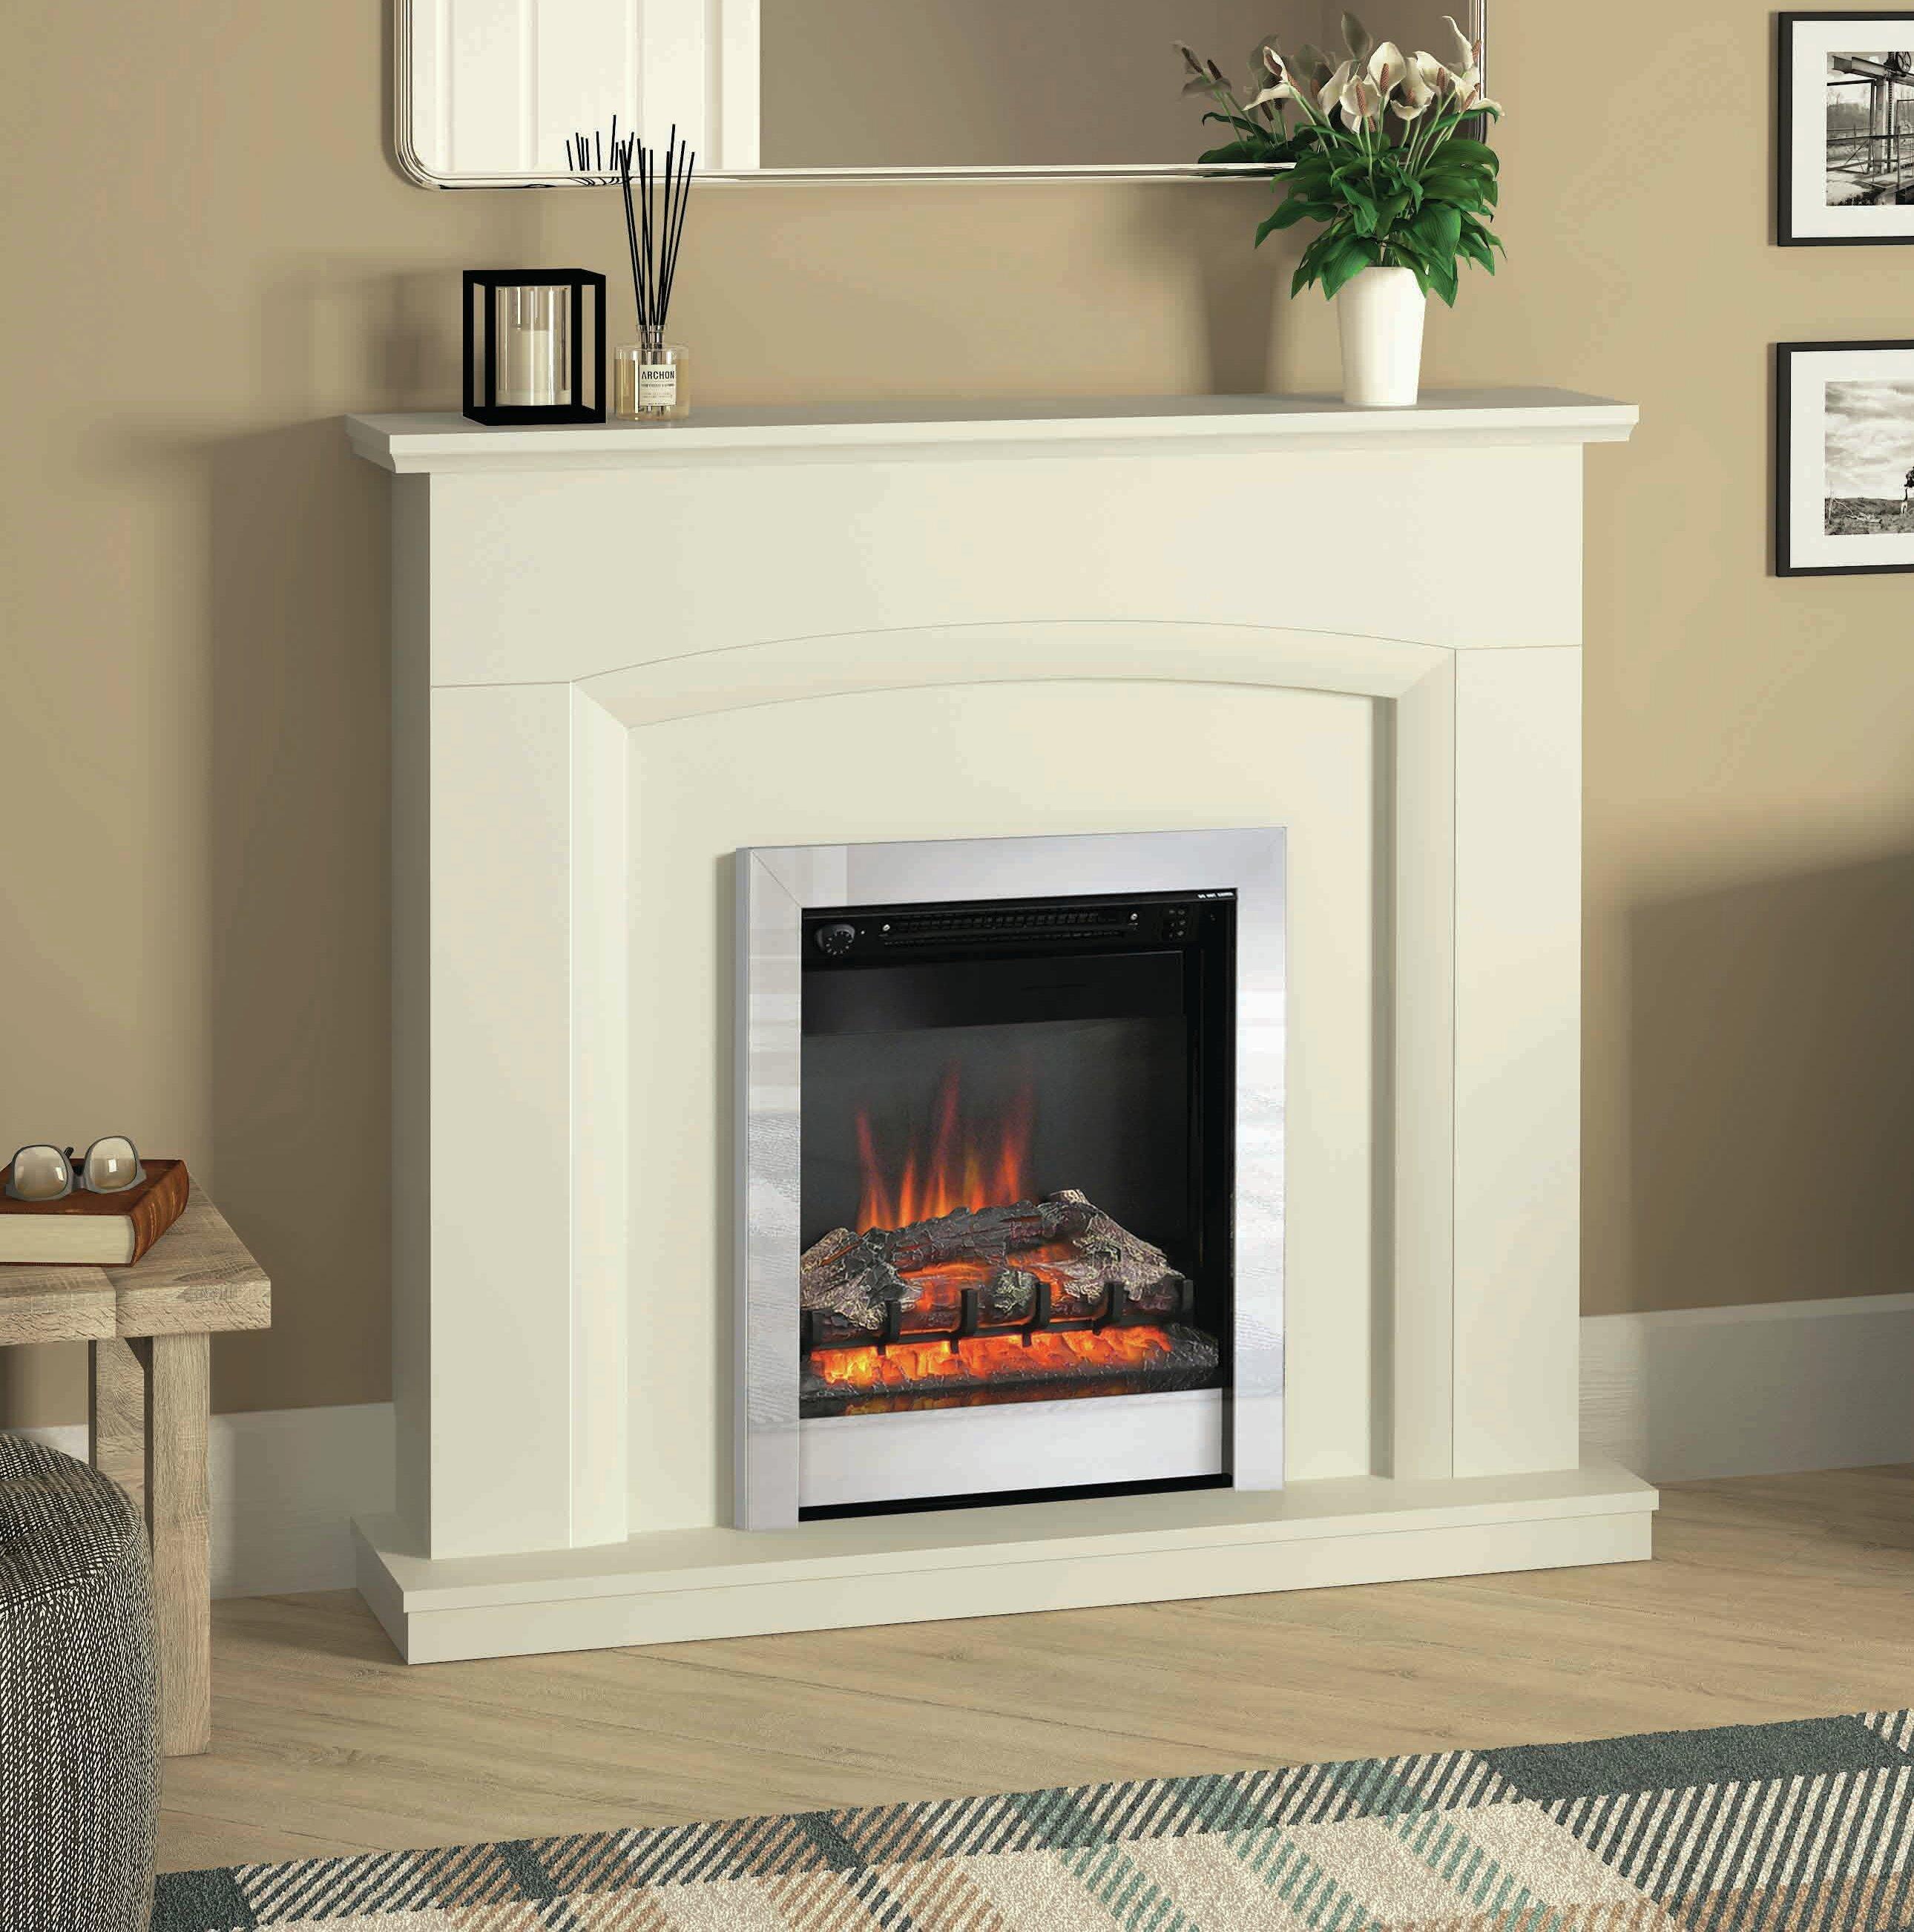 muskoka fireplace ghp zinc new inc large fireplaces catalog group mount wall product electric